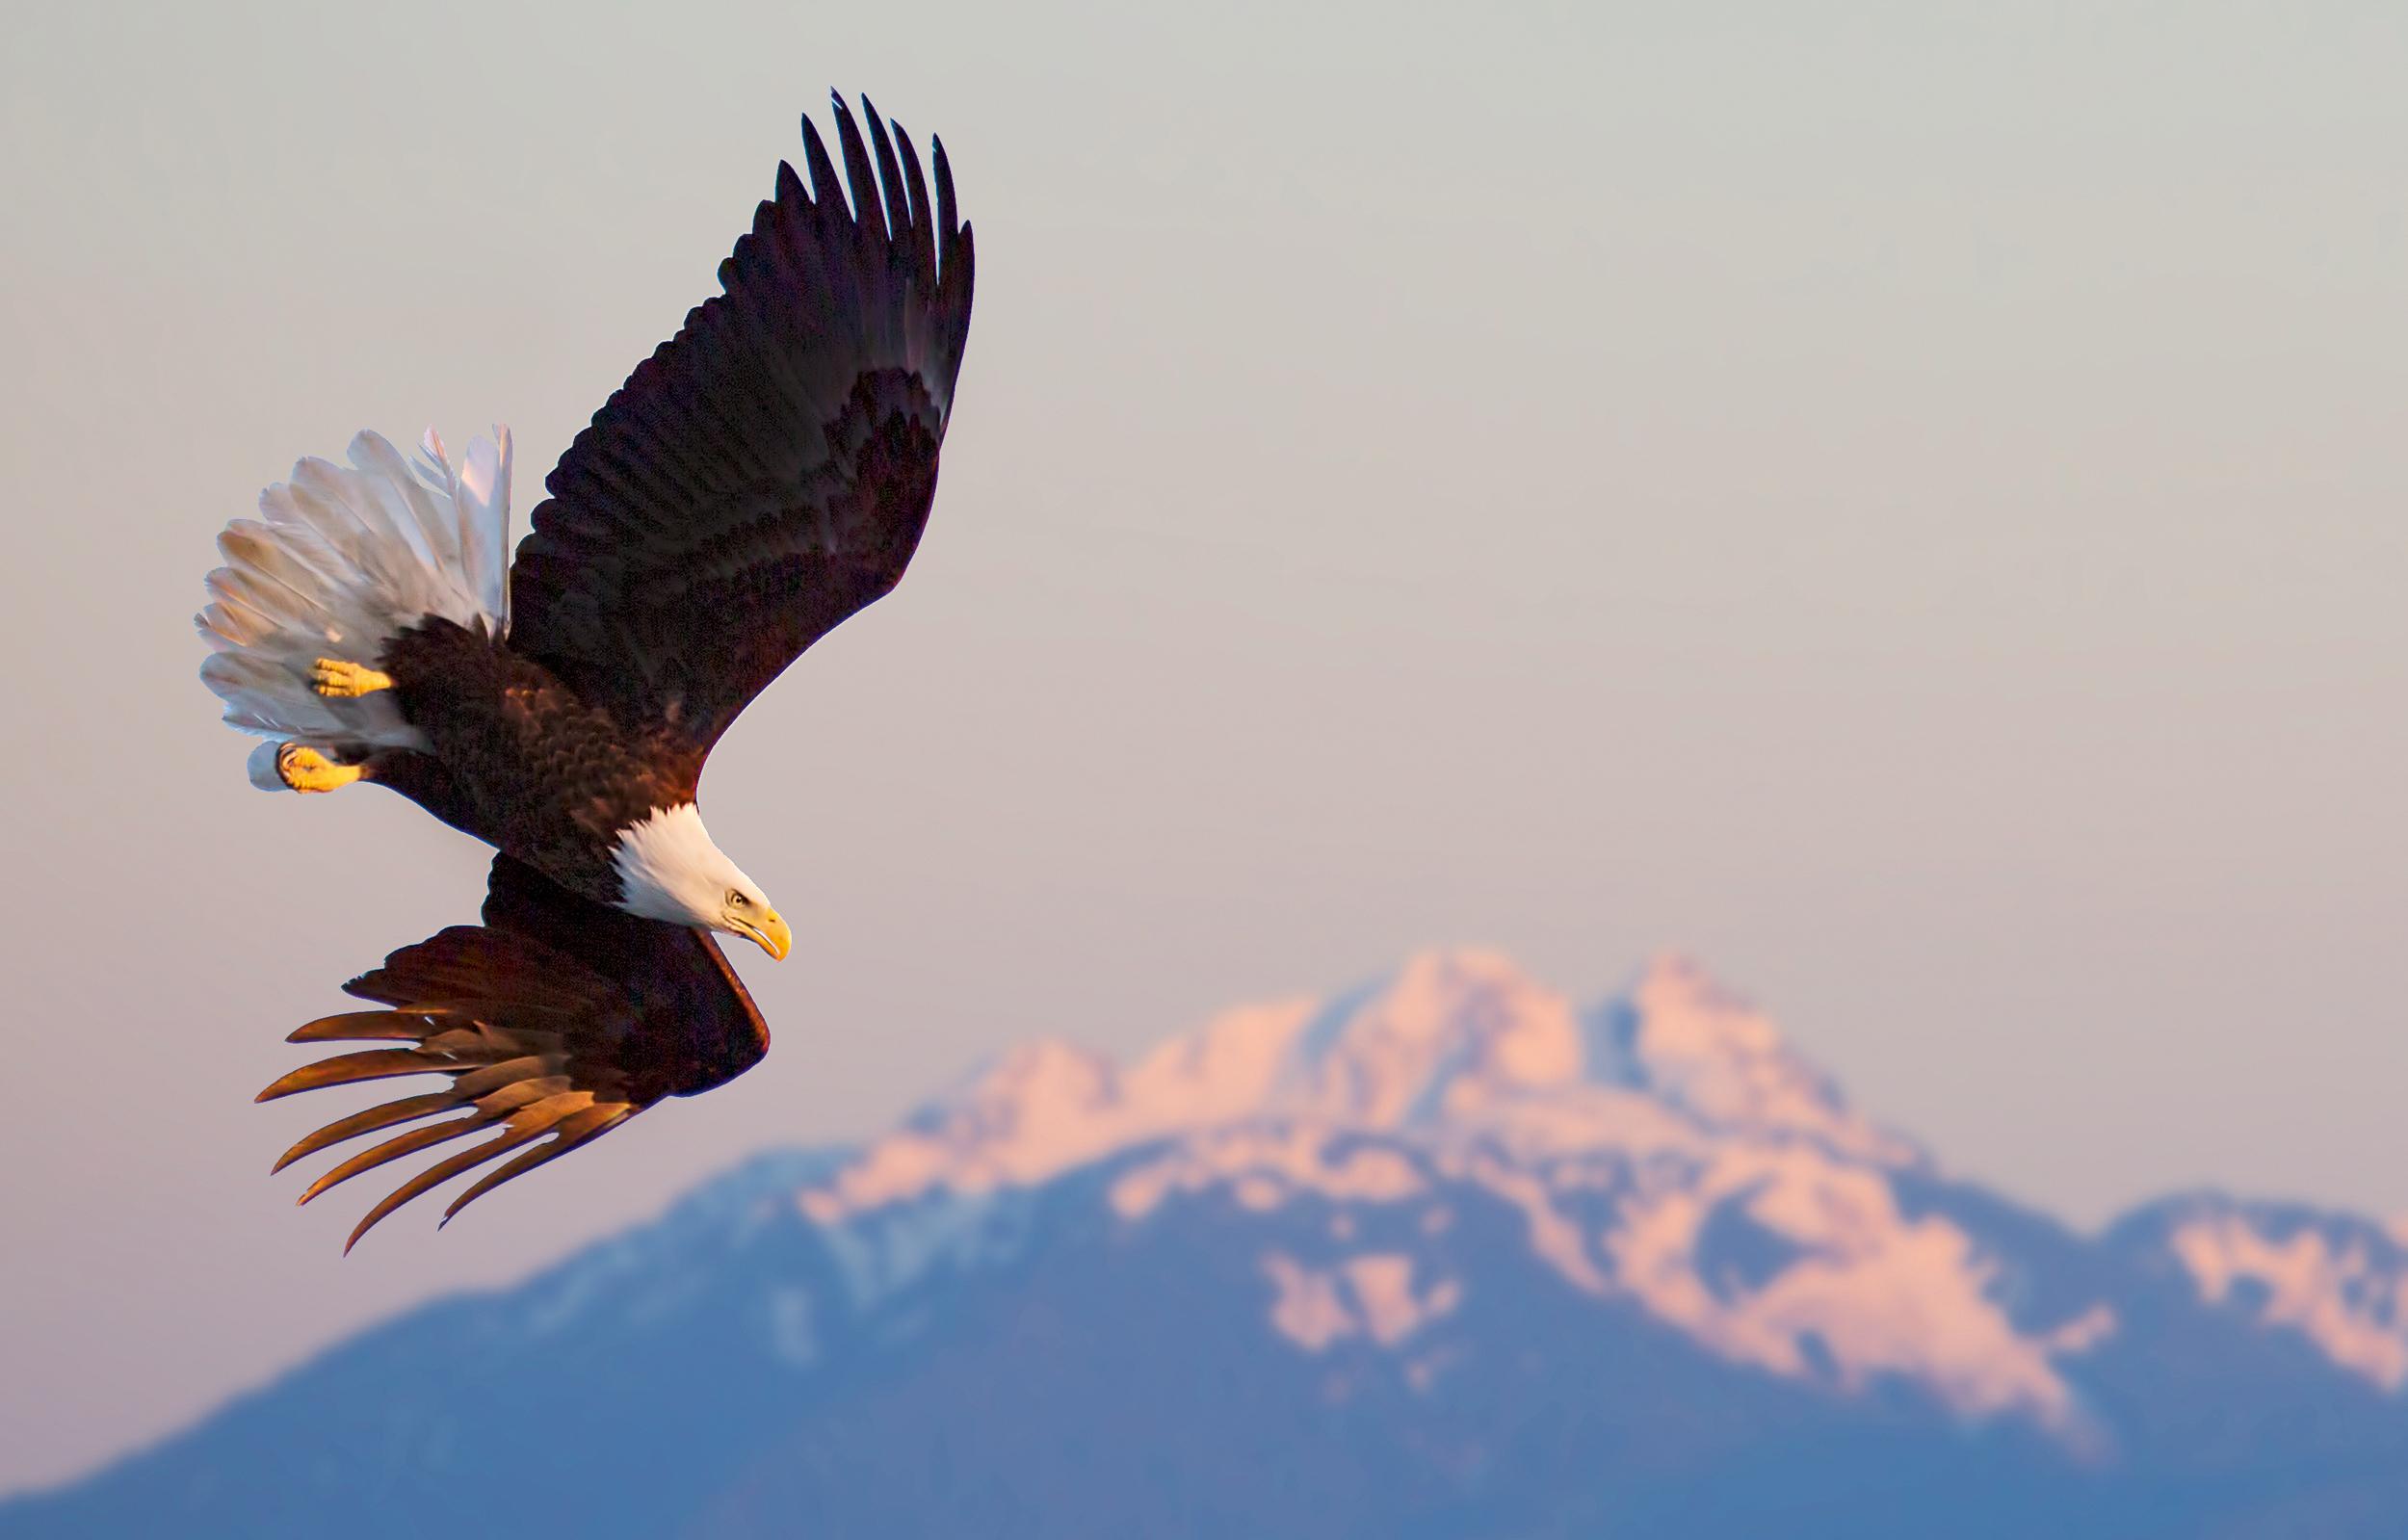 Rick Sammon's Birds008.jpg